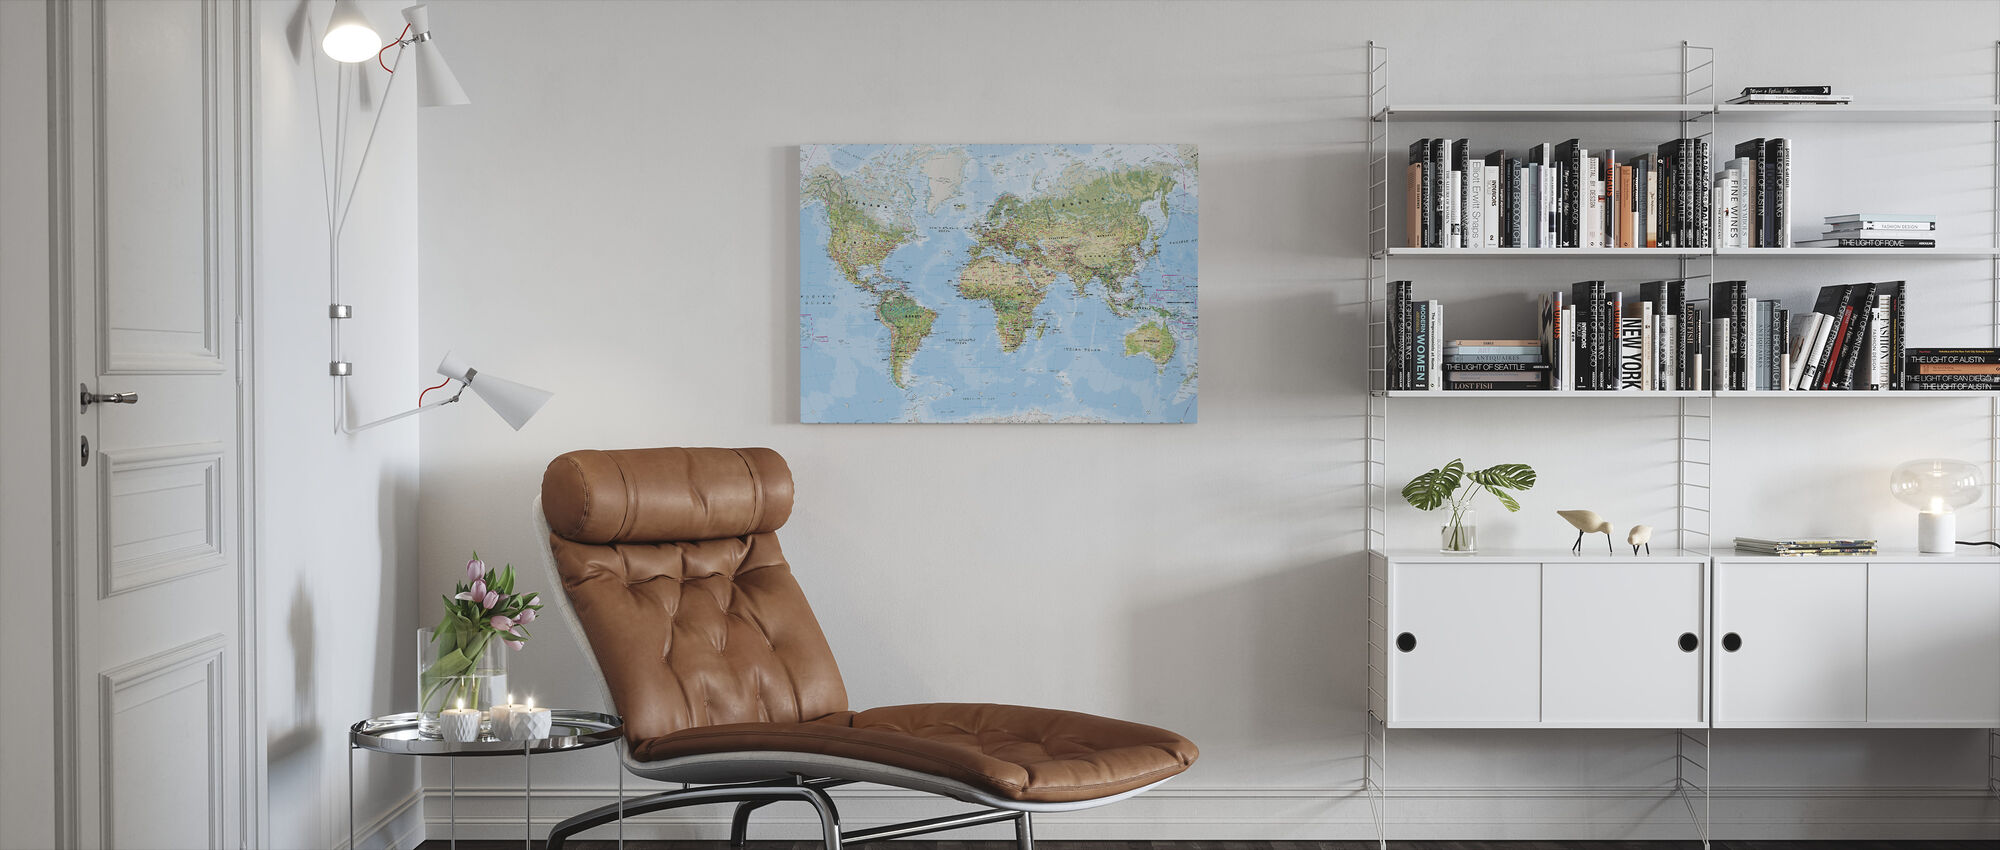 World Kartta - Canvastaulu - Olohuone